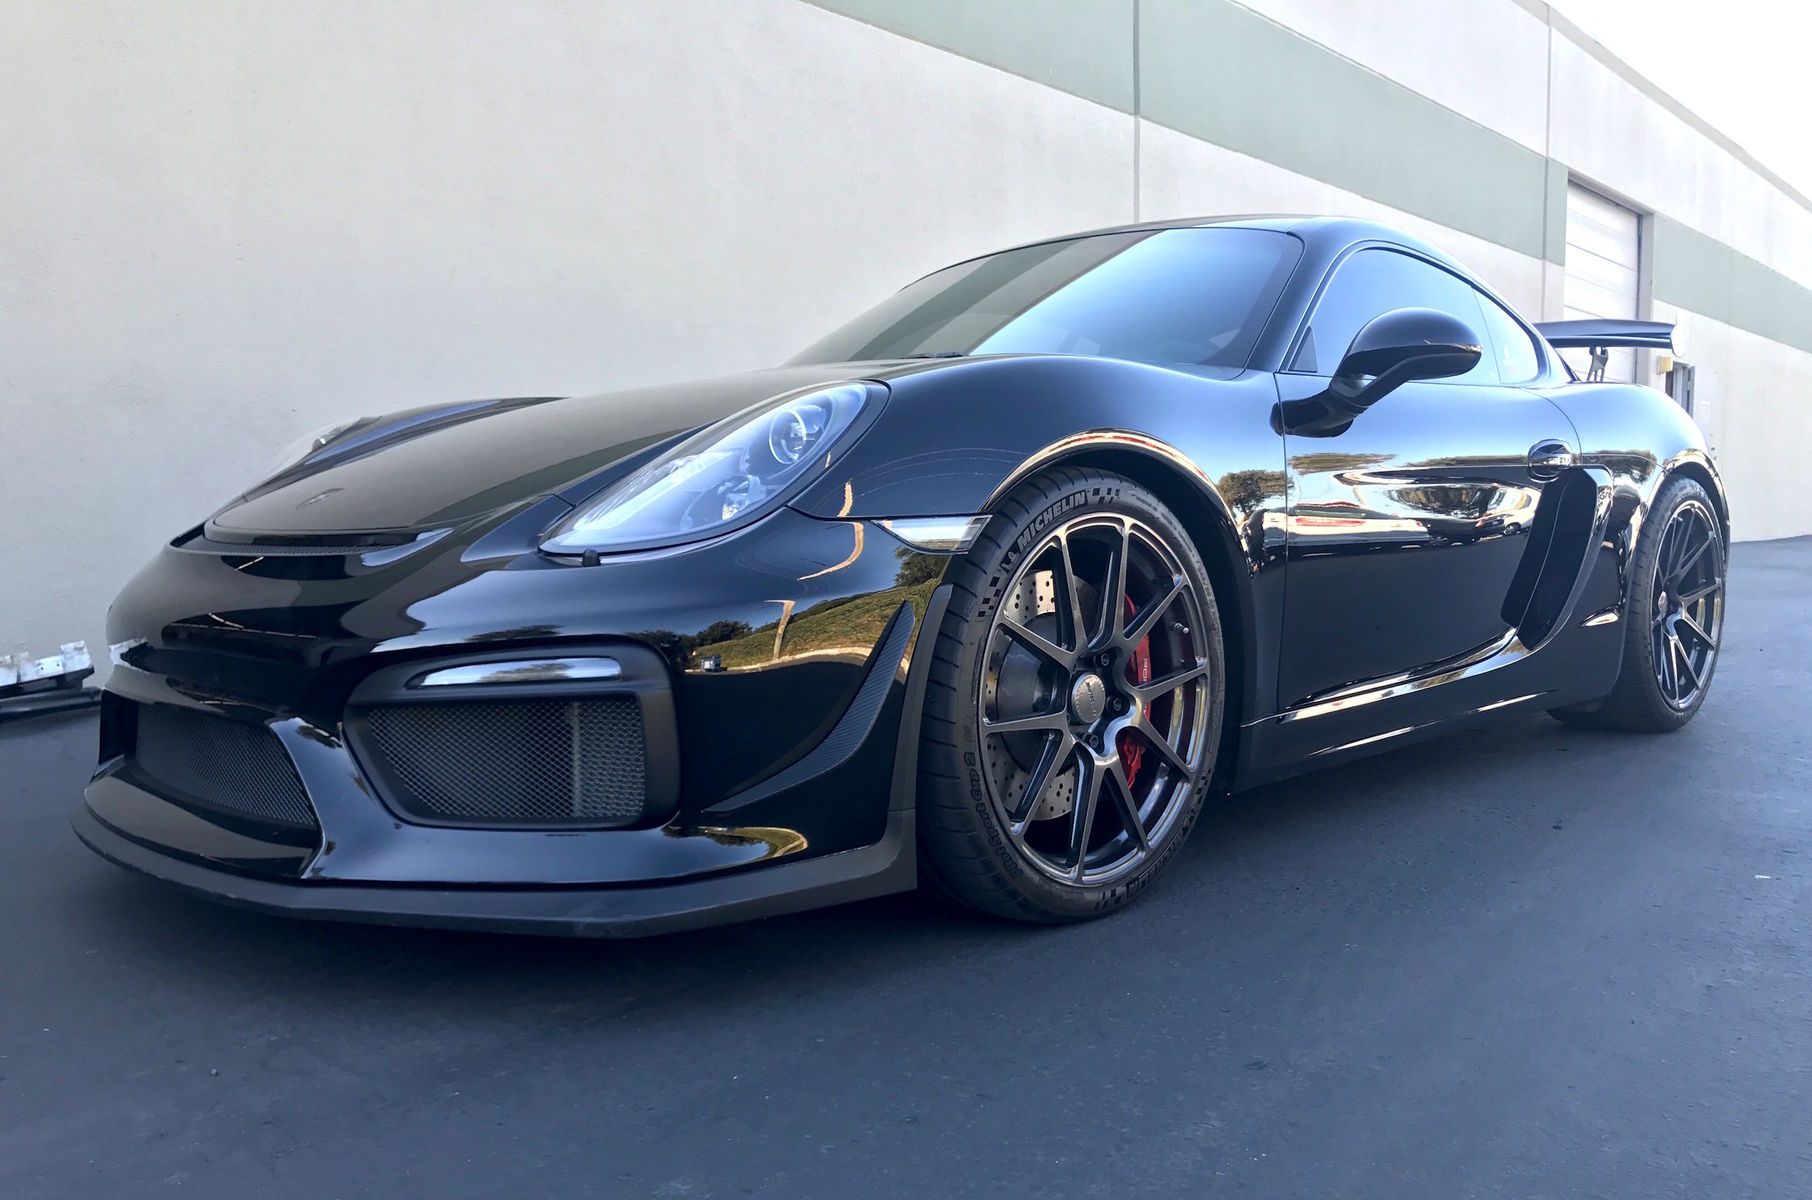 2018 Porsche Cayman | Ida's Sharkafied Porsche Cayman GT4 on Forgeline One piece Forged Monoblock GA1R Open Lug Wheels